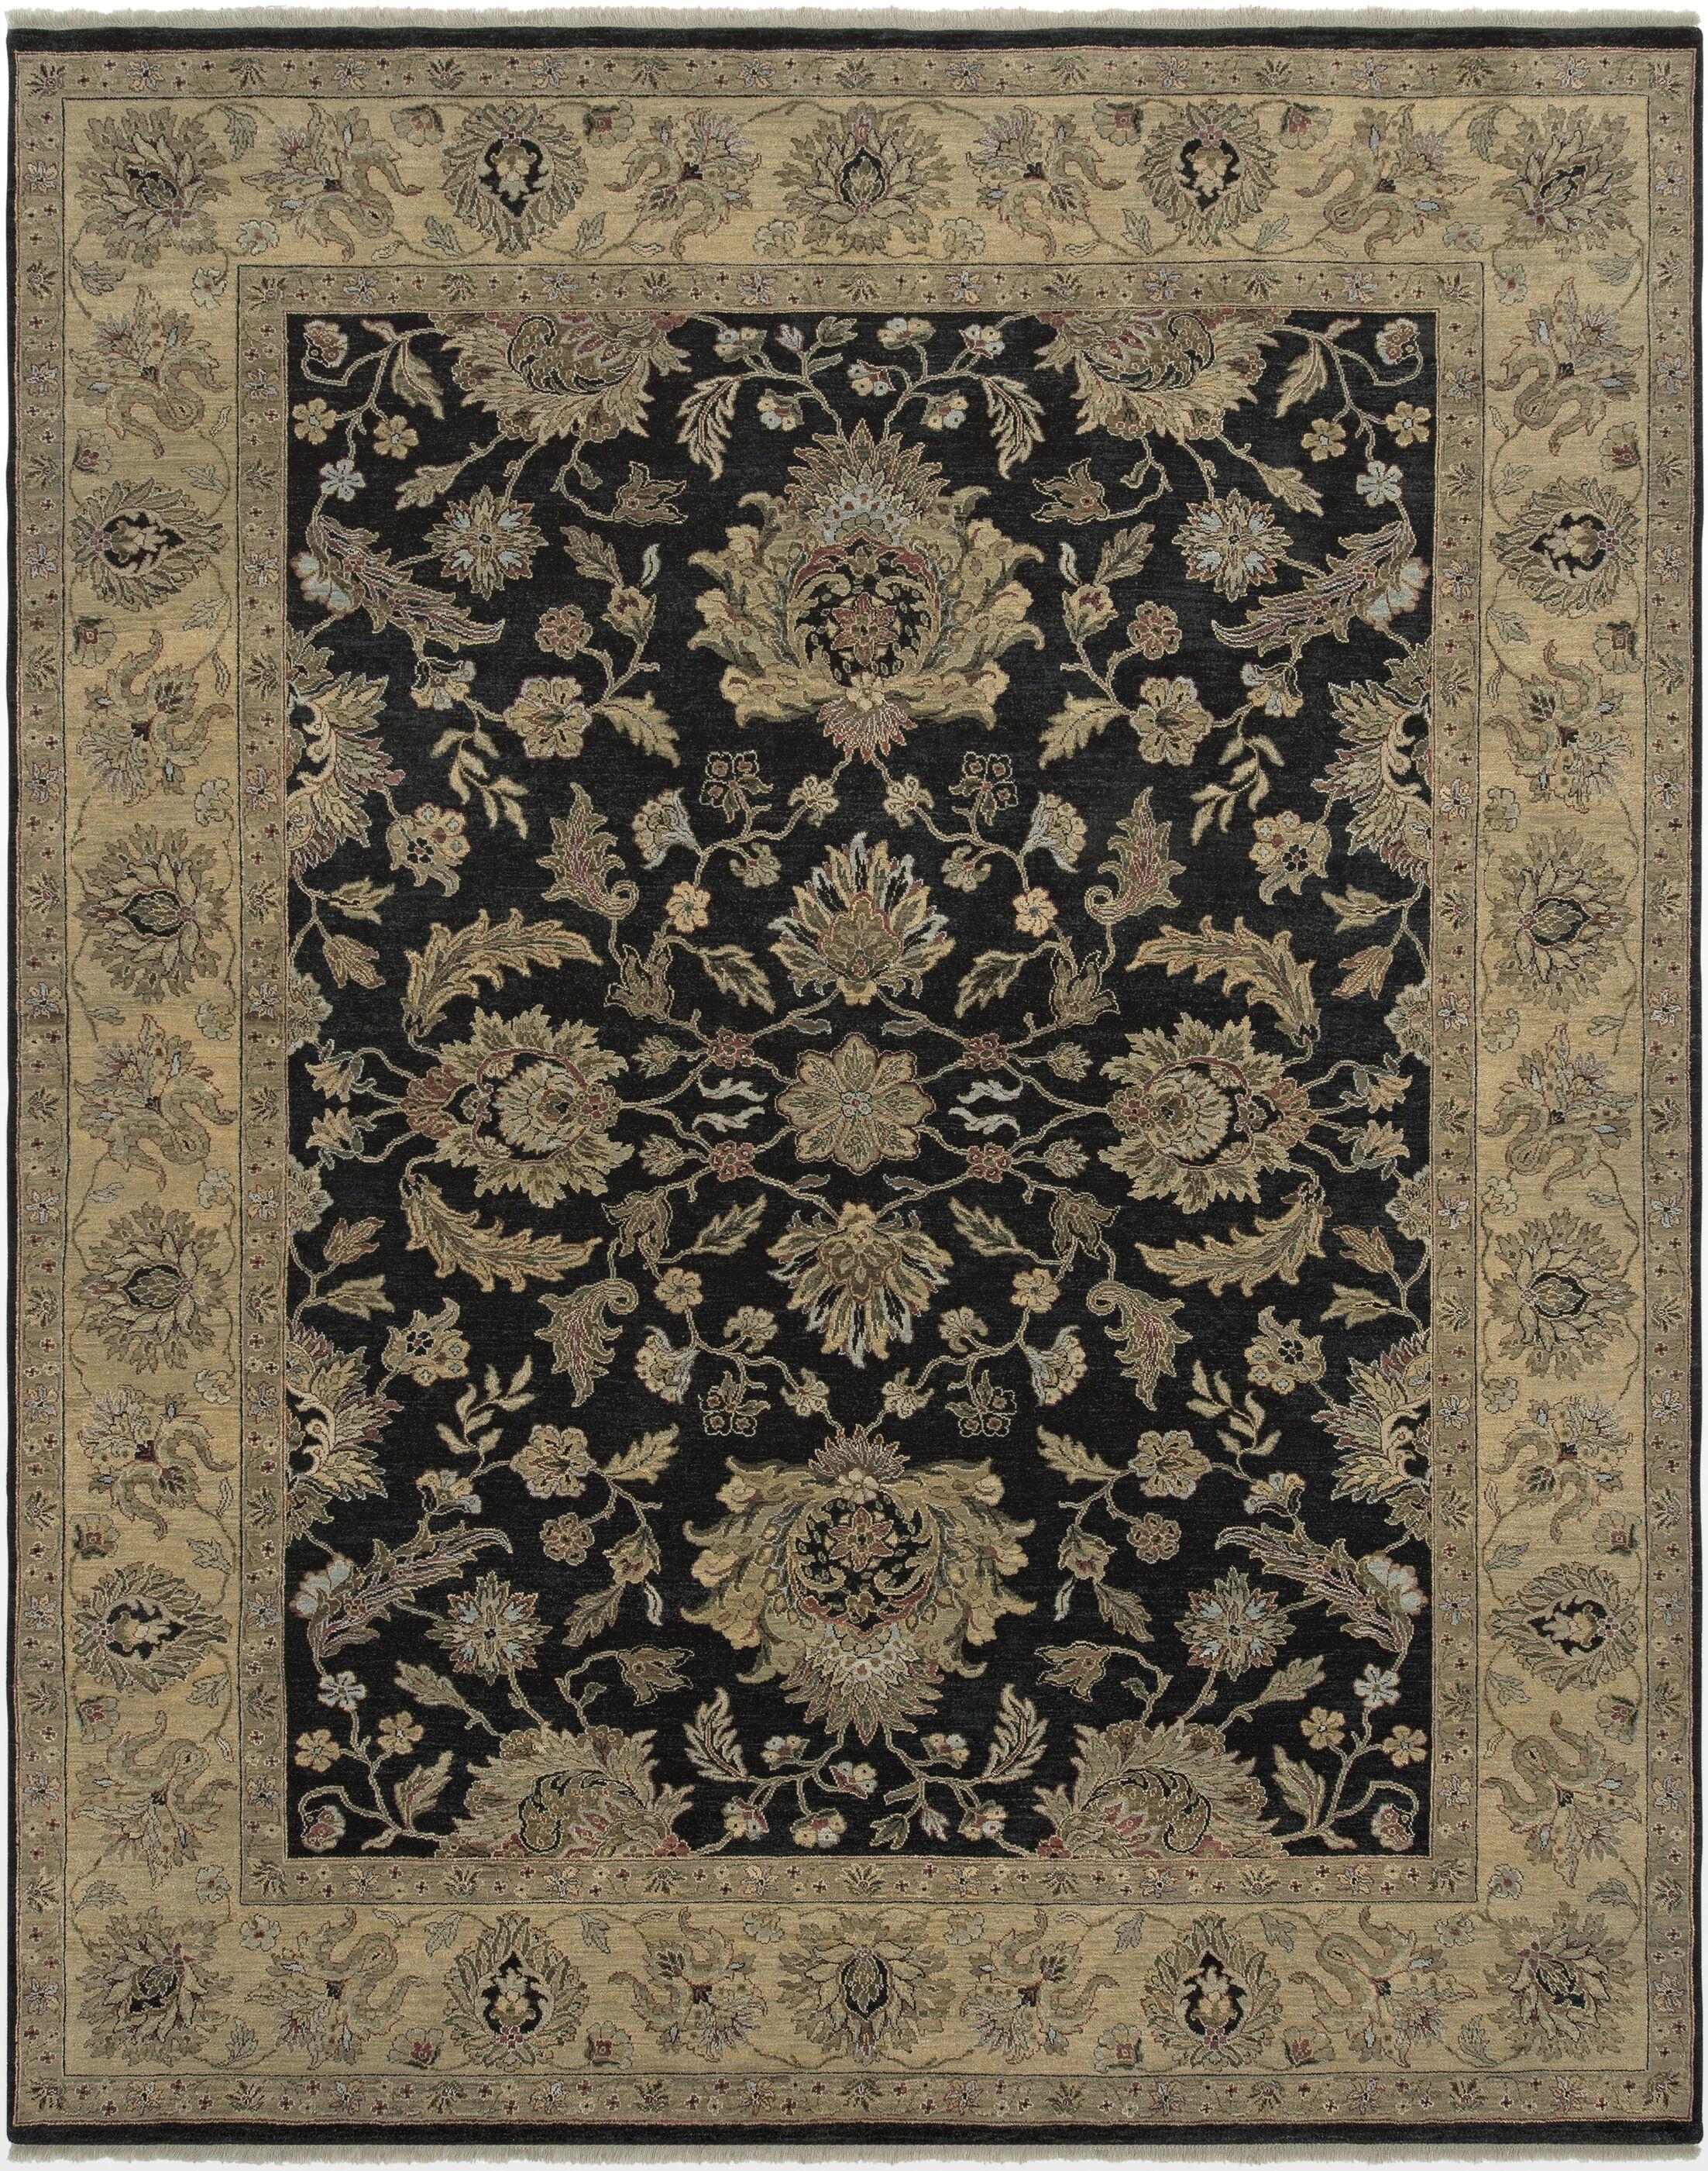 Lidiaídia Ebony/Gold Area Rug Rug Size: 10' x 14'